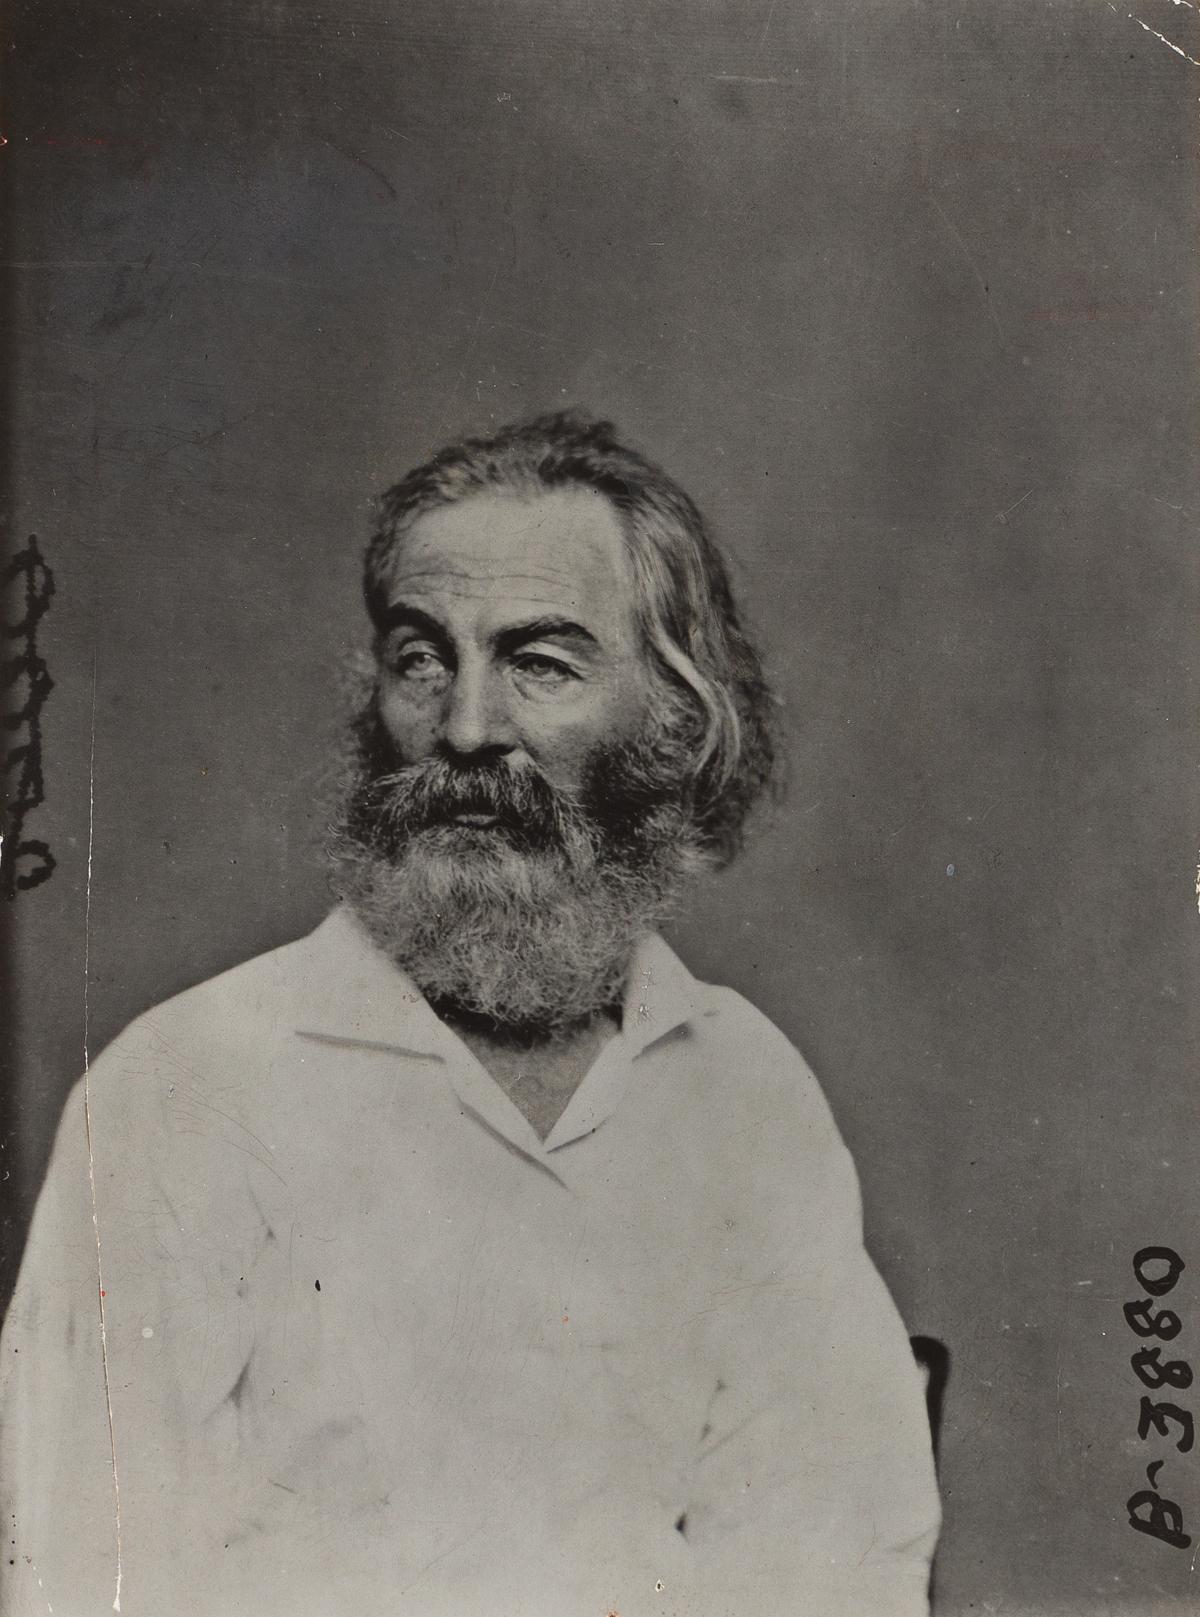 MATHEW BRADY (1822-1896) Portrait of Walt Whitman.